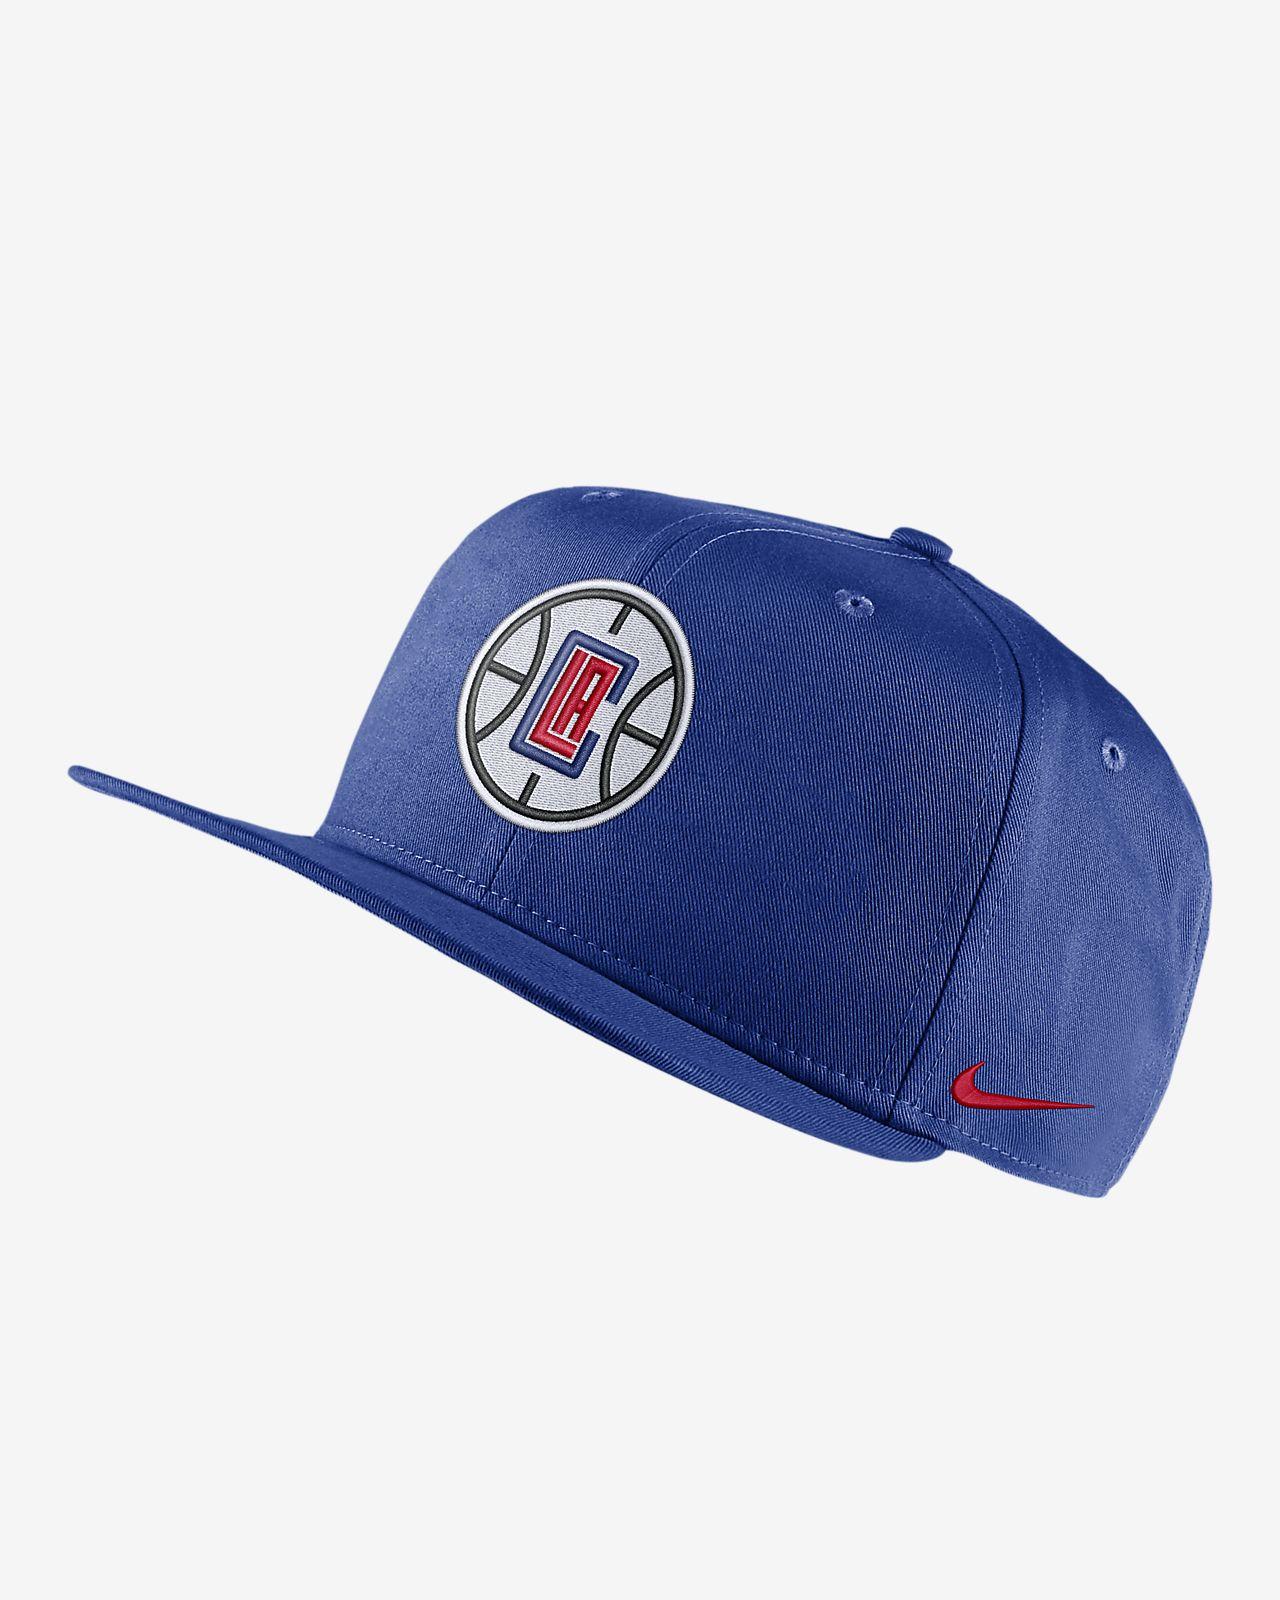 LA Clippers Nike Pro NBA sapka